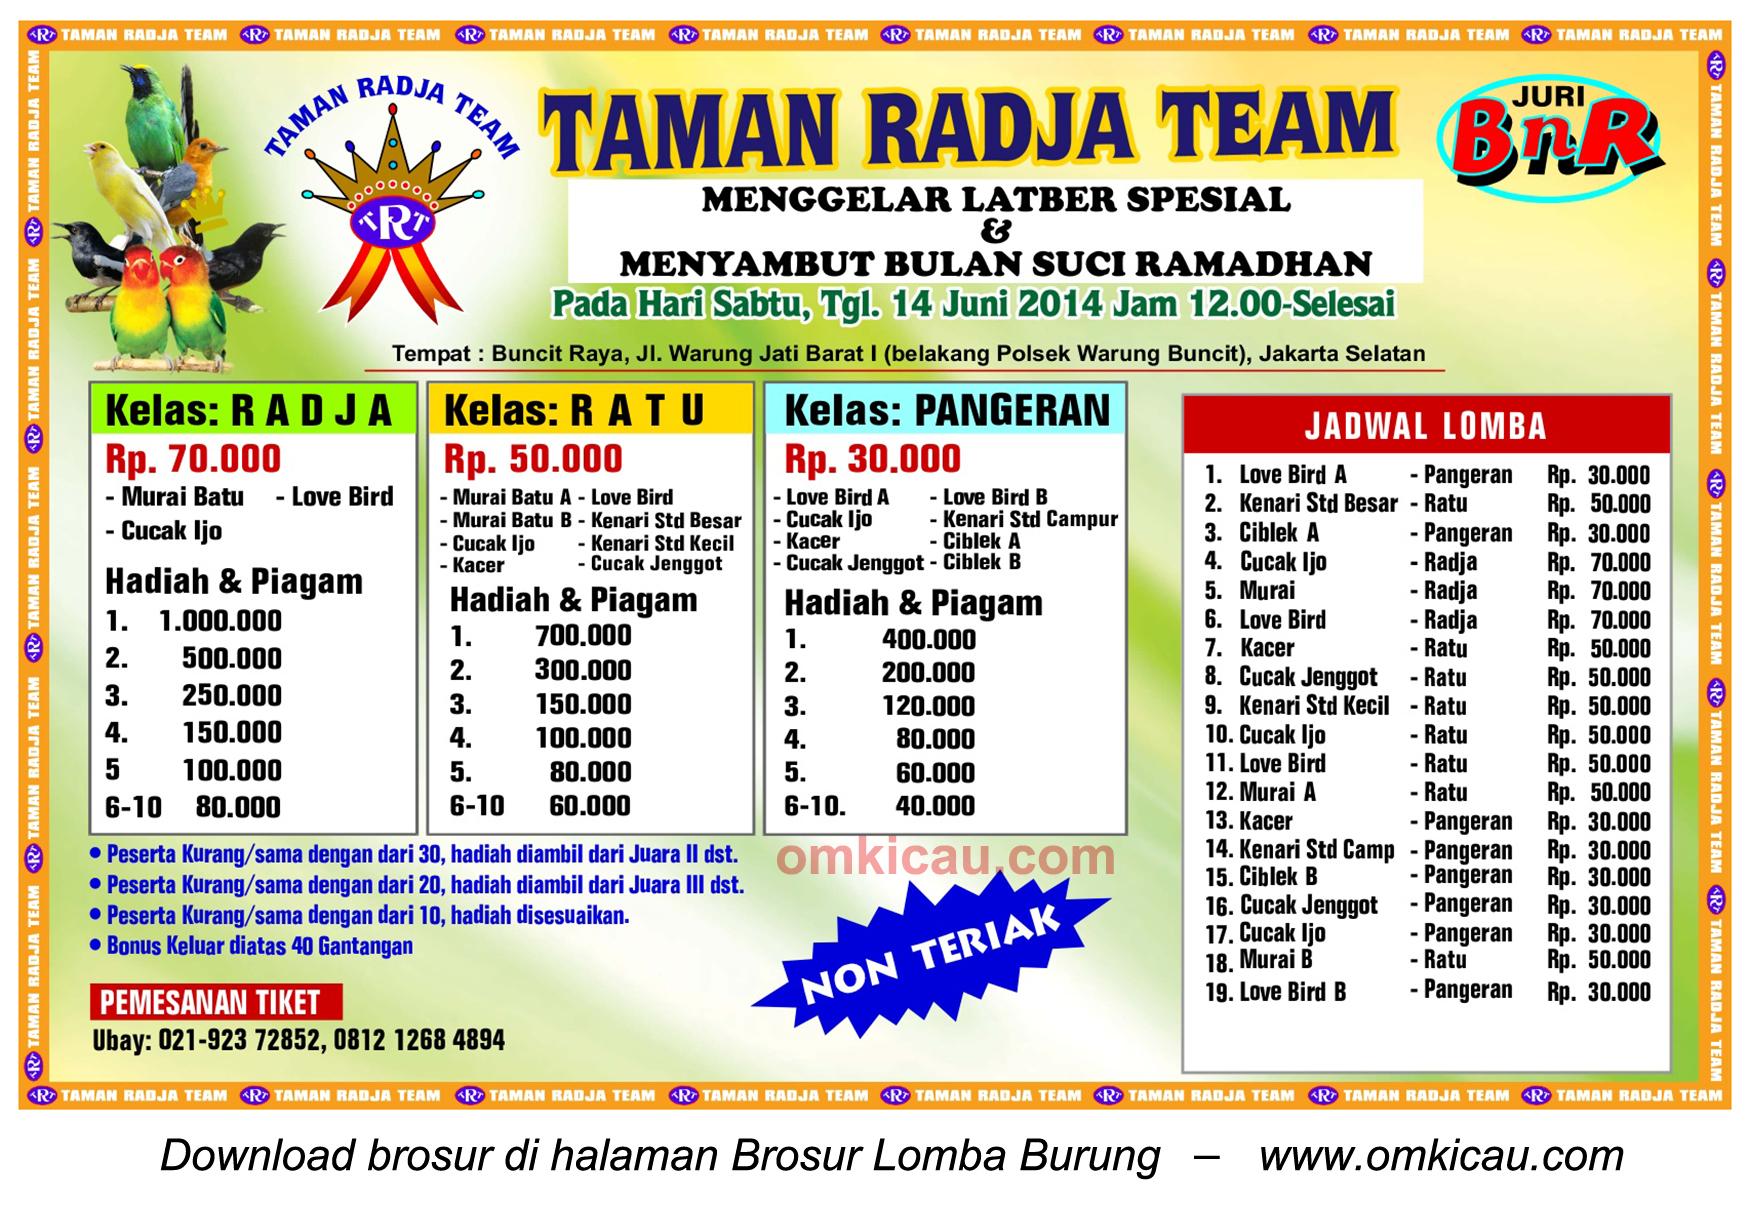 Brosur Latber Spesial Taman Radja Team, Jakarta Selatan, 14 Juni 2014